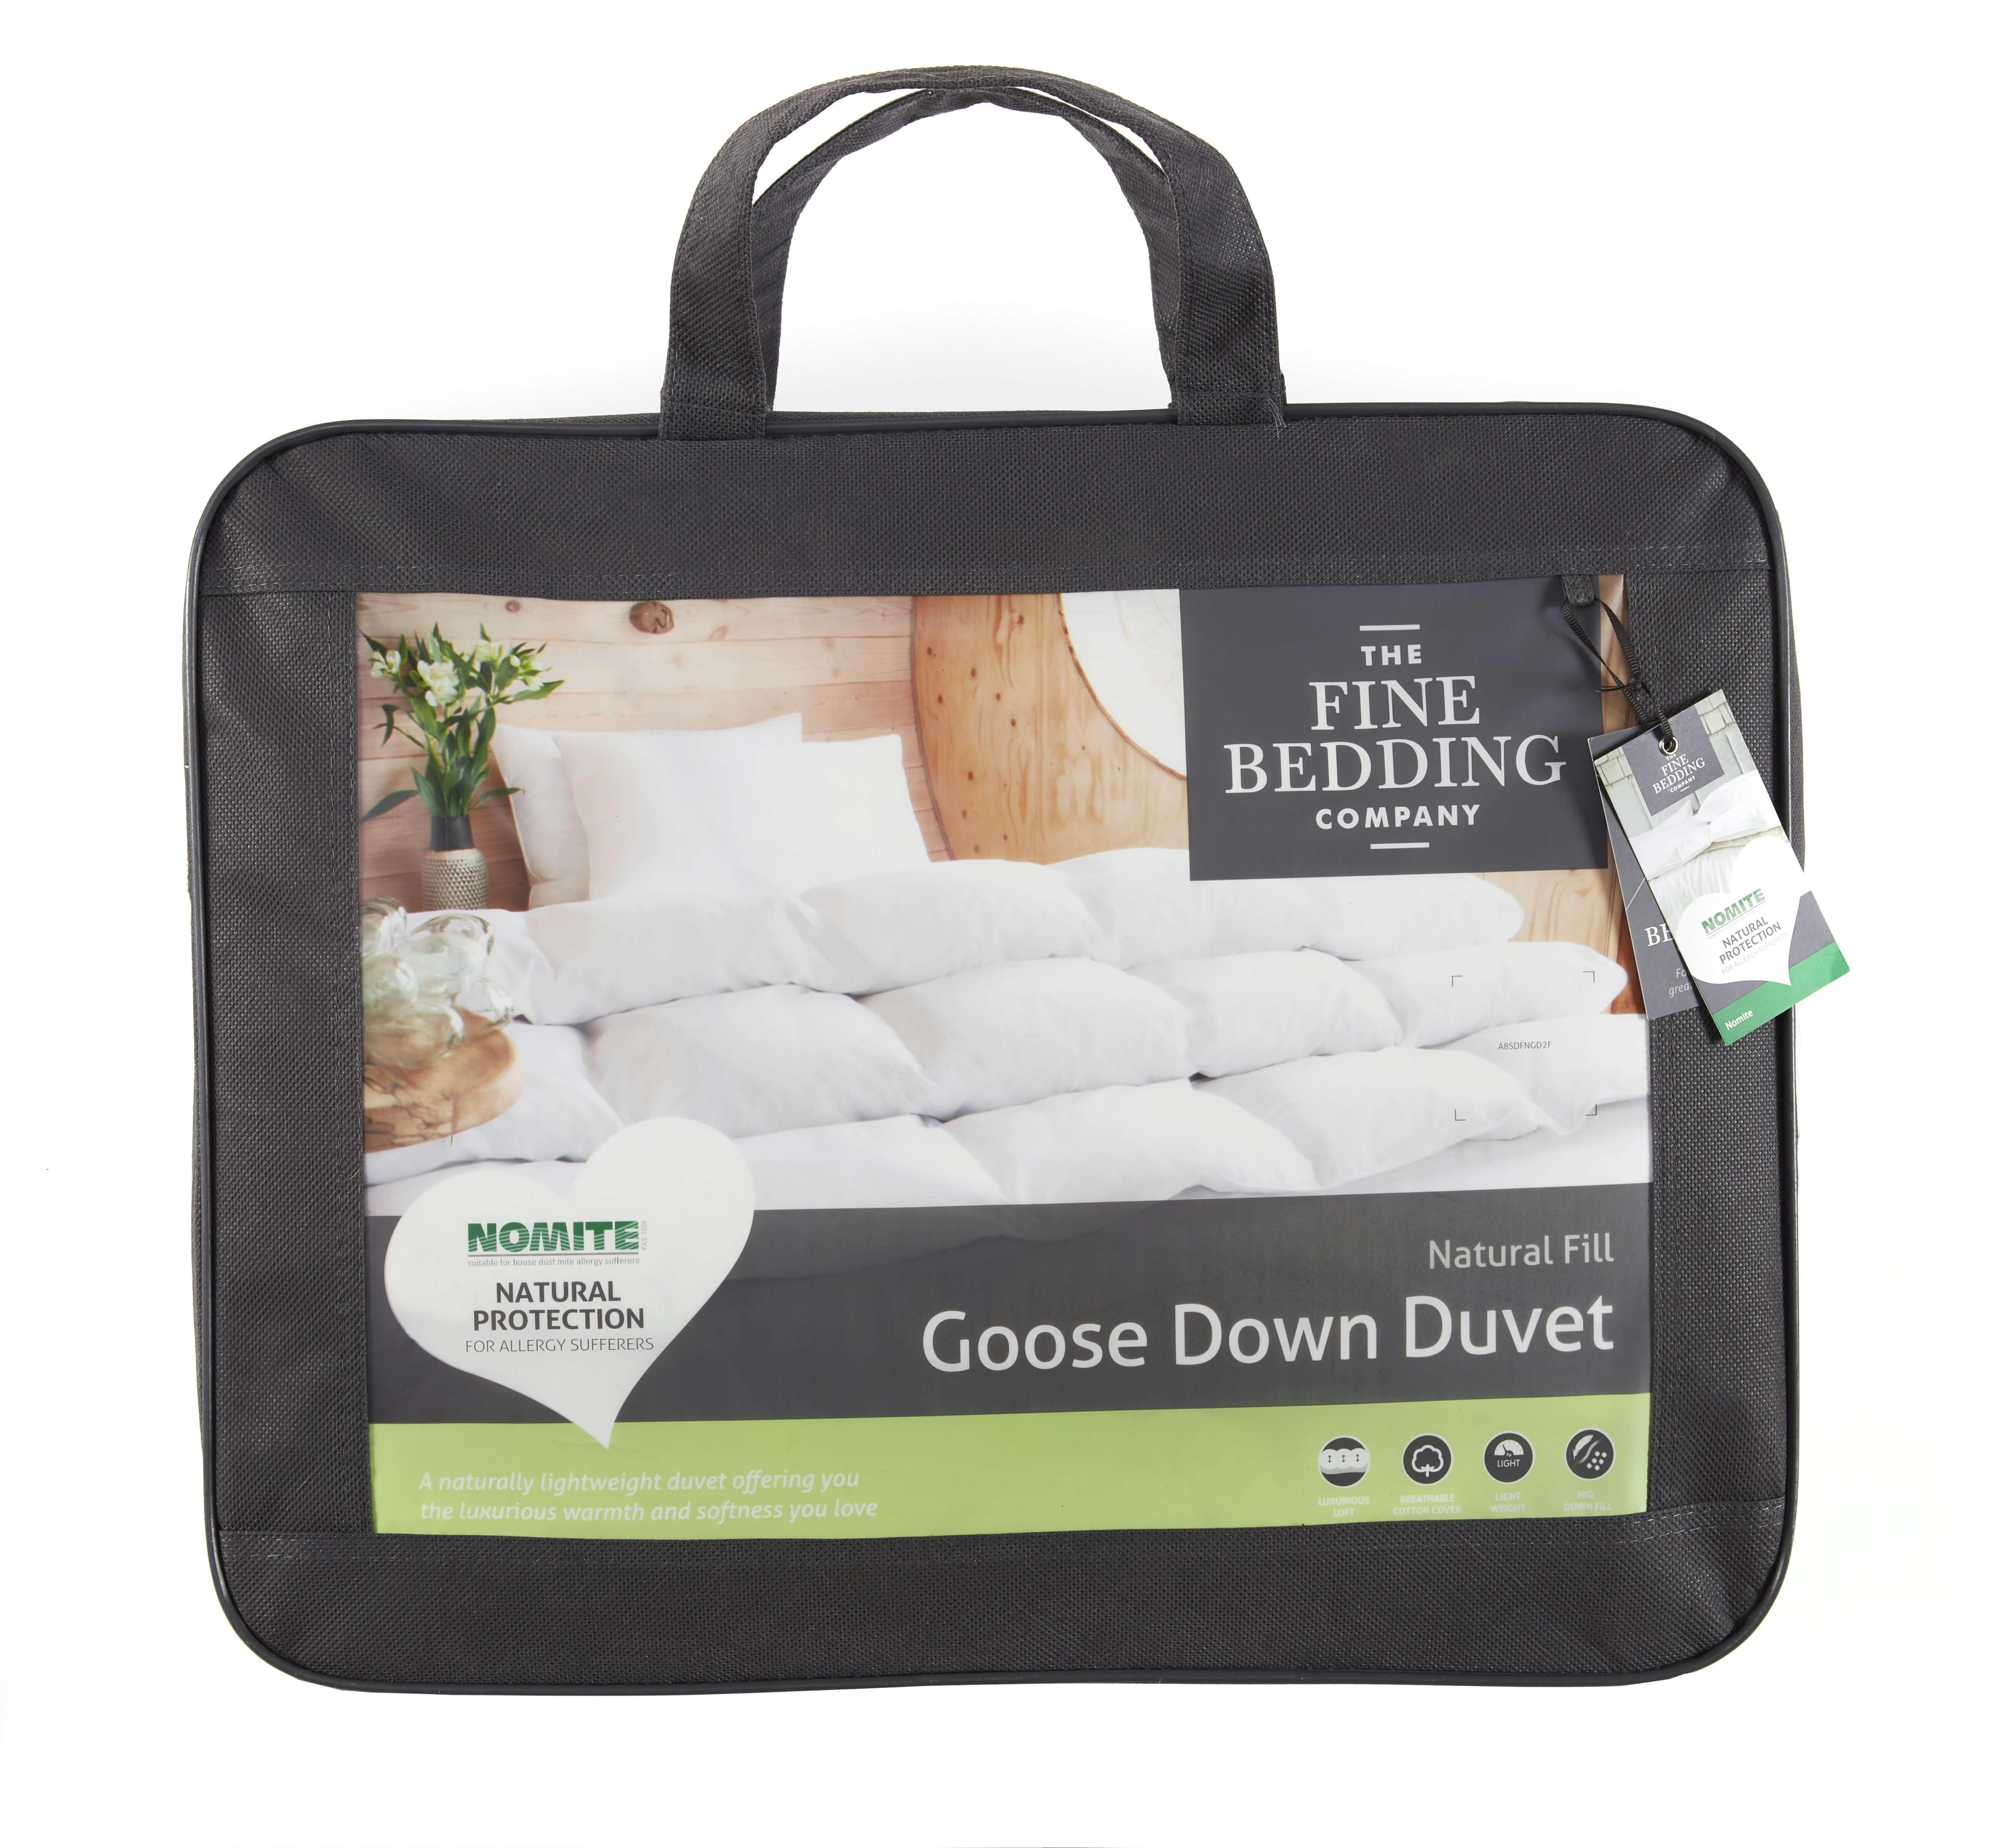 Goose Down Duvet - The Fine Bedding Company